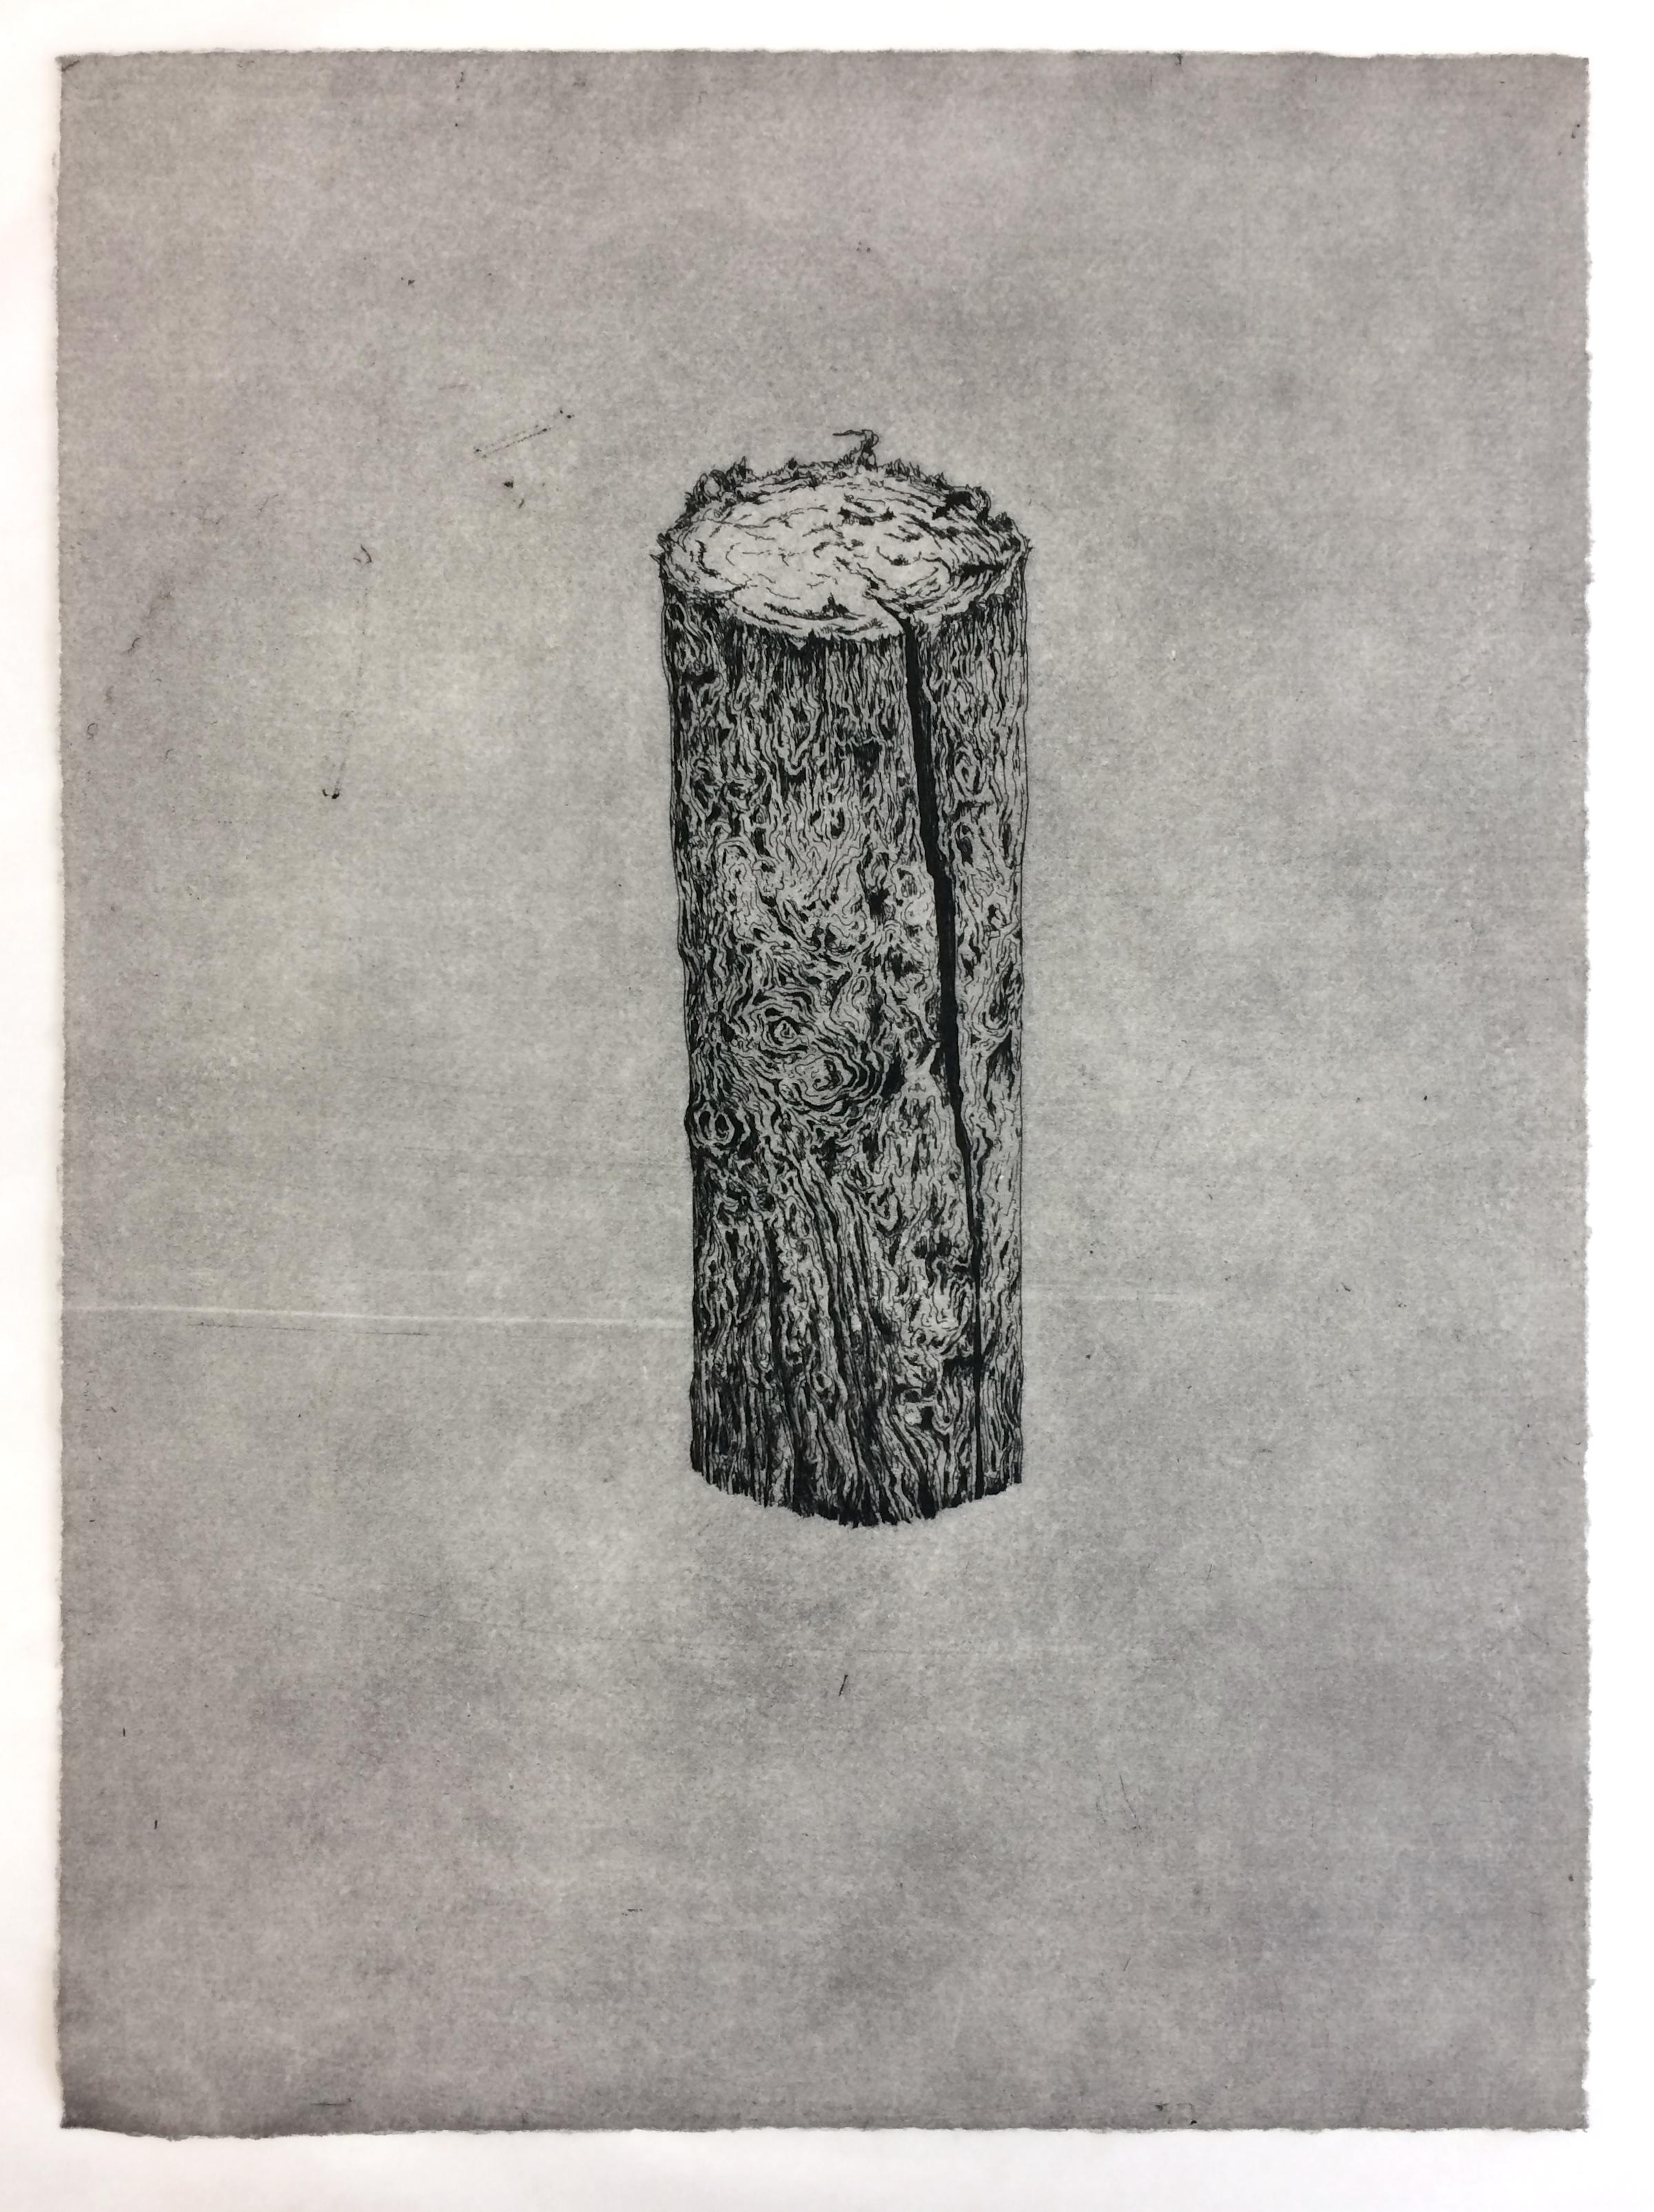 'Peg' - Hardground etching, 29 x 42cm